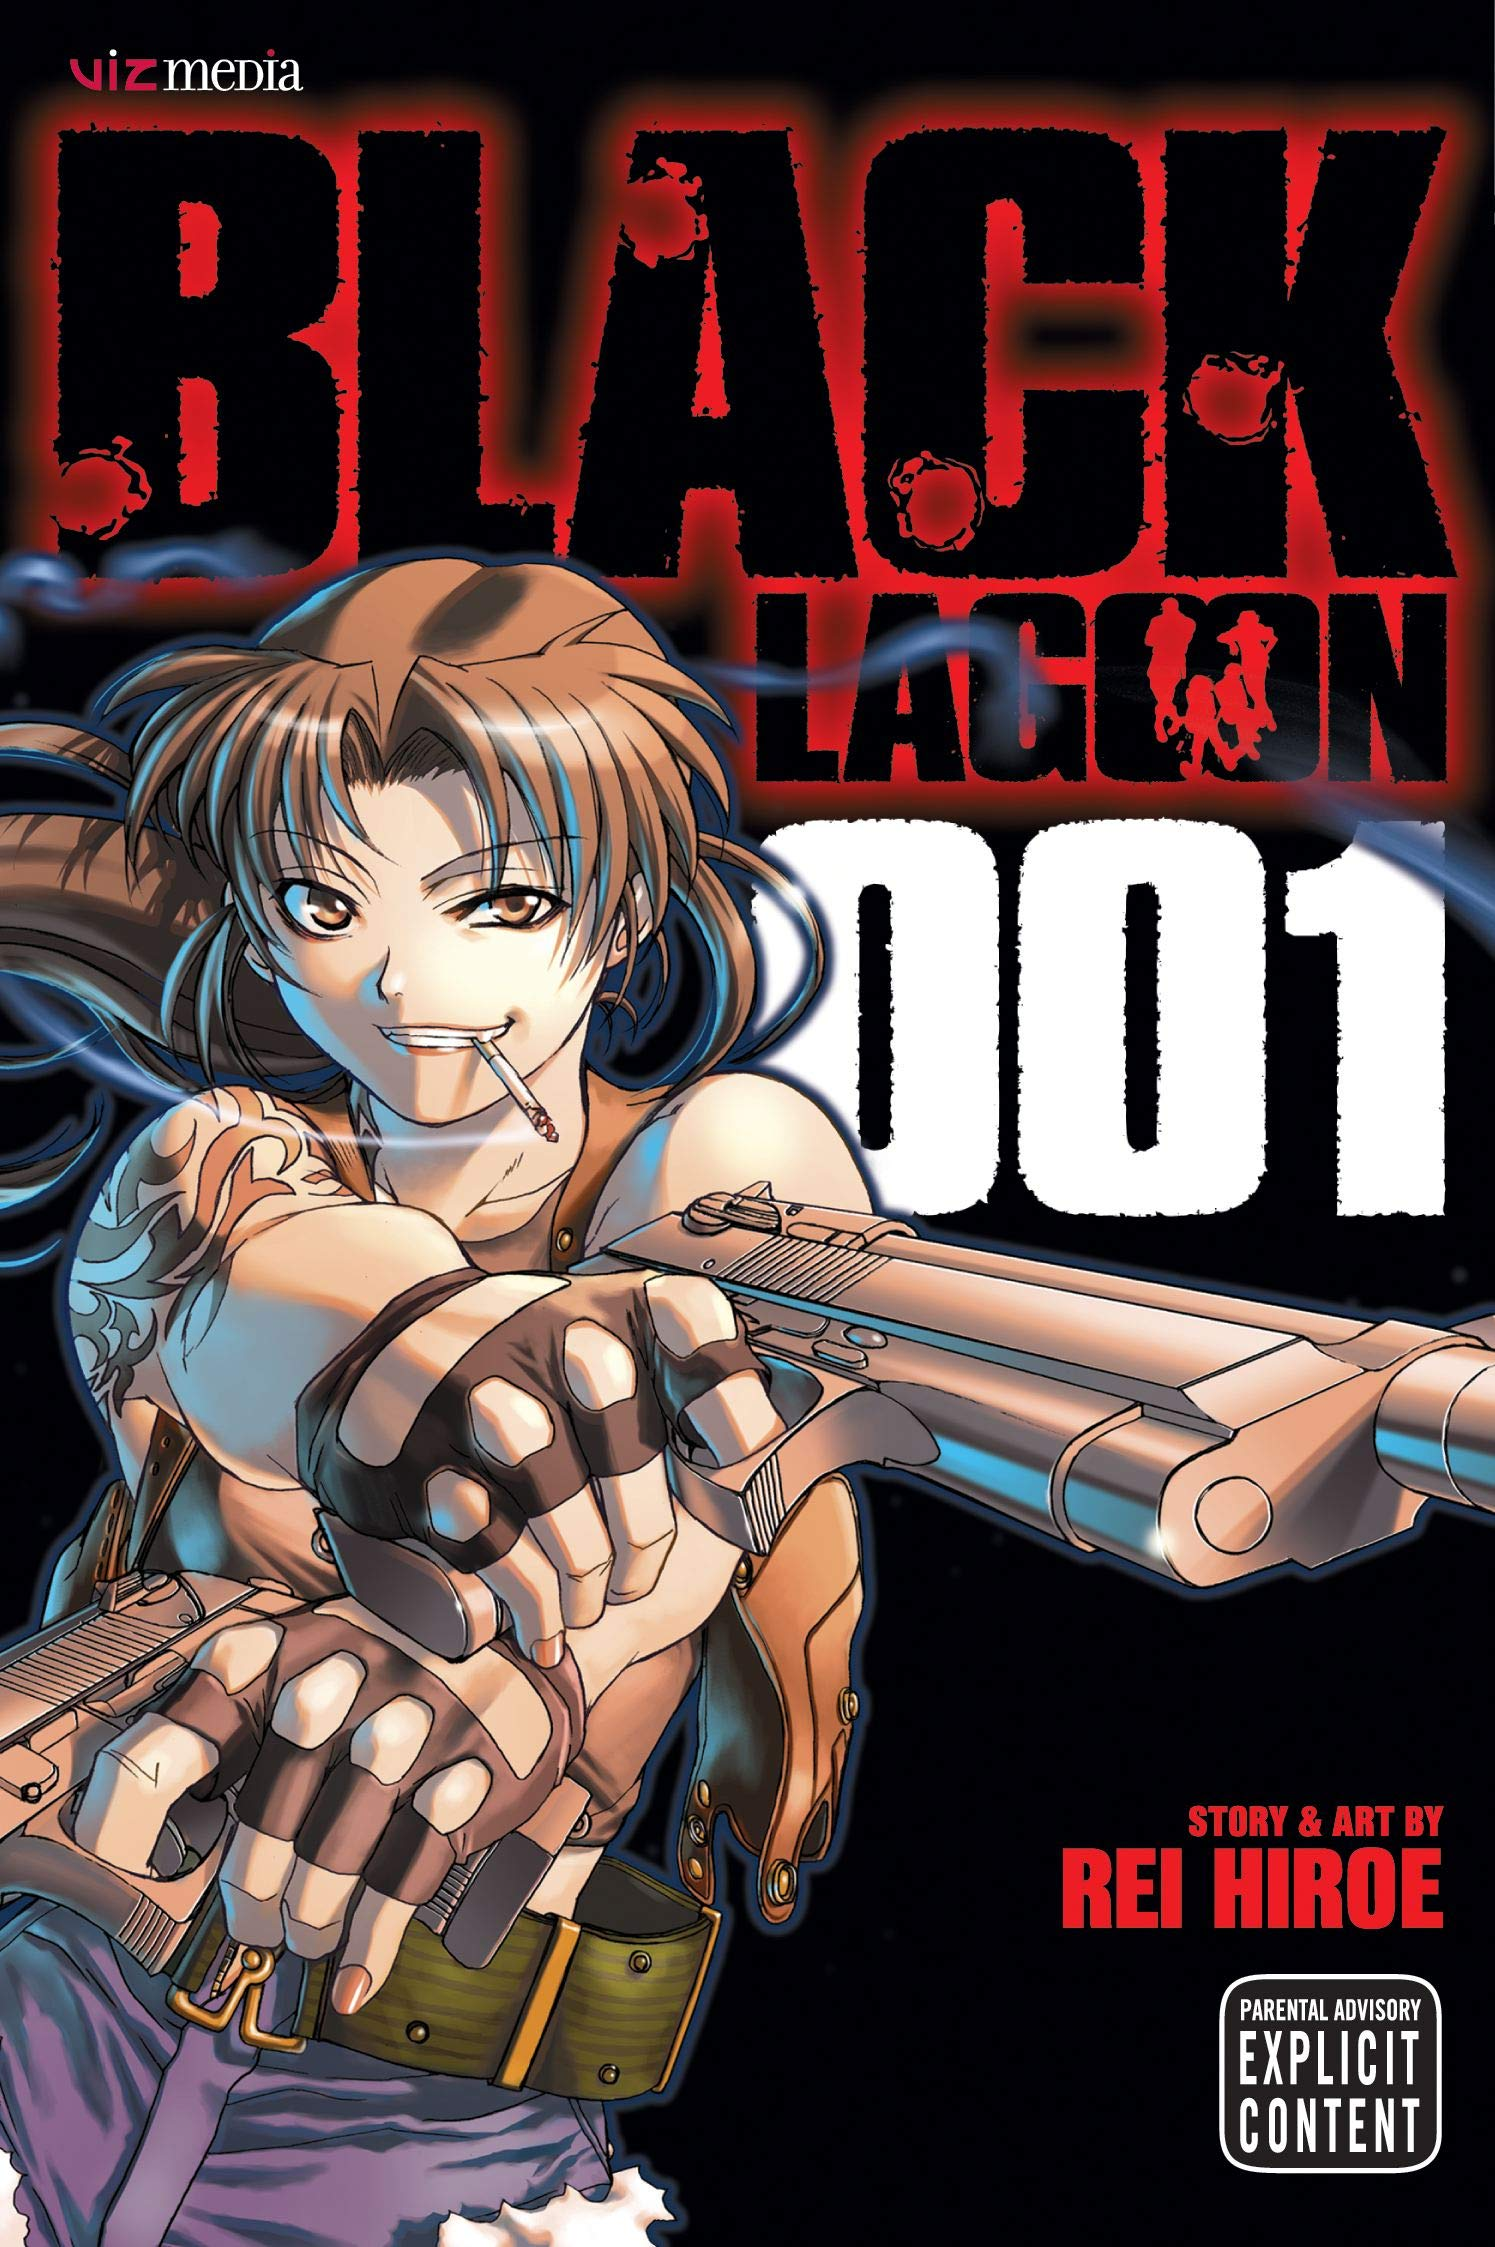 5 Rekomendasi Top Manga Bergenre Gangster/Mafia yang Wajib Kamu Baca 3